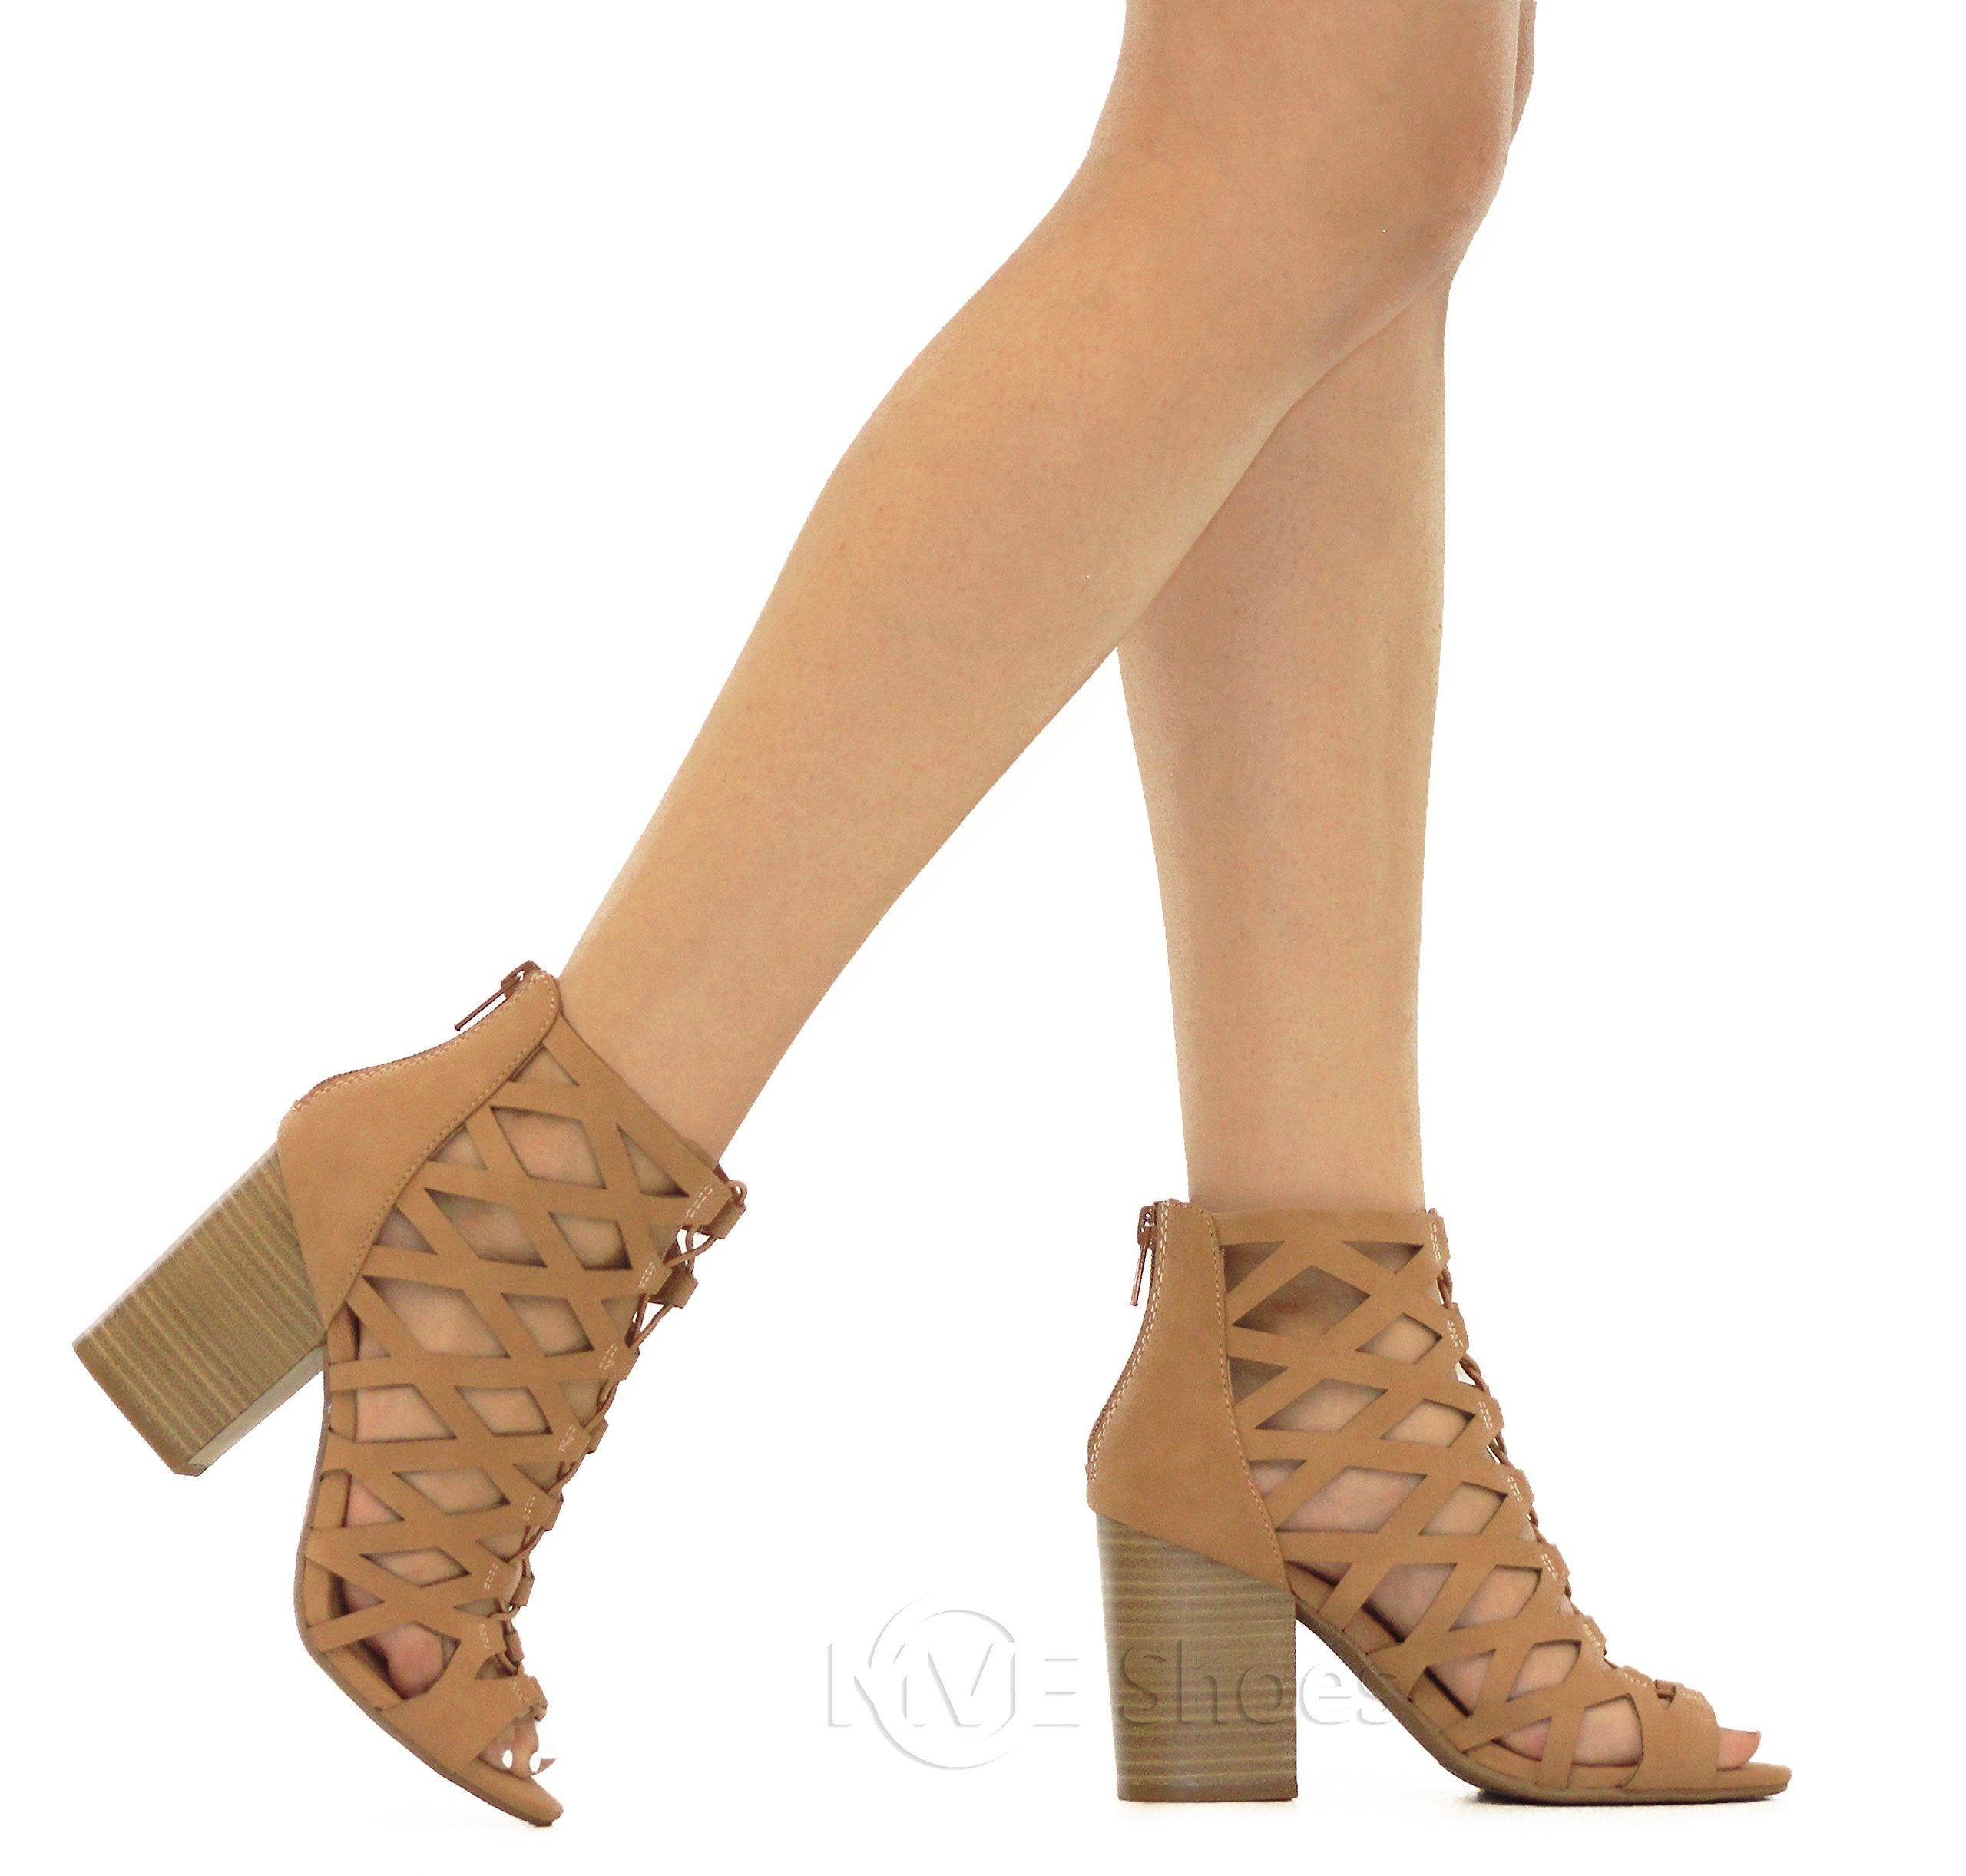 MVE Shoes Women's Open Toe Strappy Back Zipper Chunky Heel, tan nb Size 10 by MVE Shoes (Image #4)